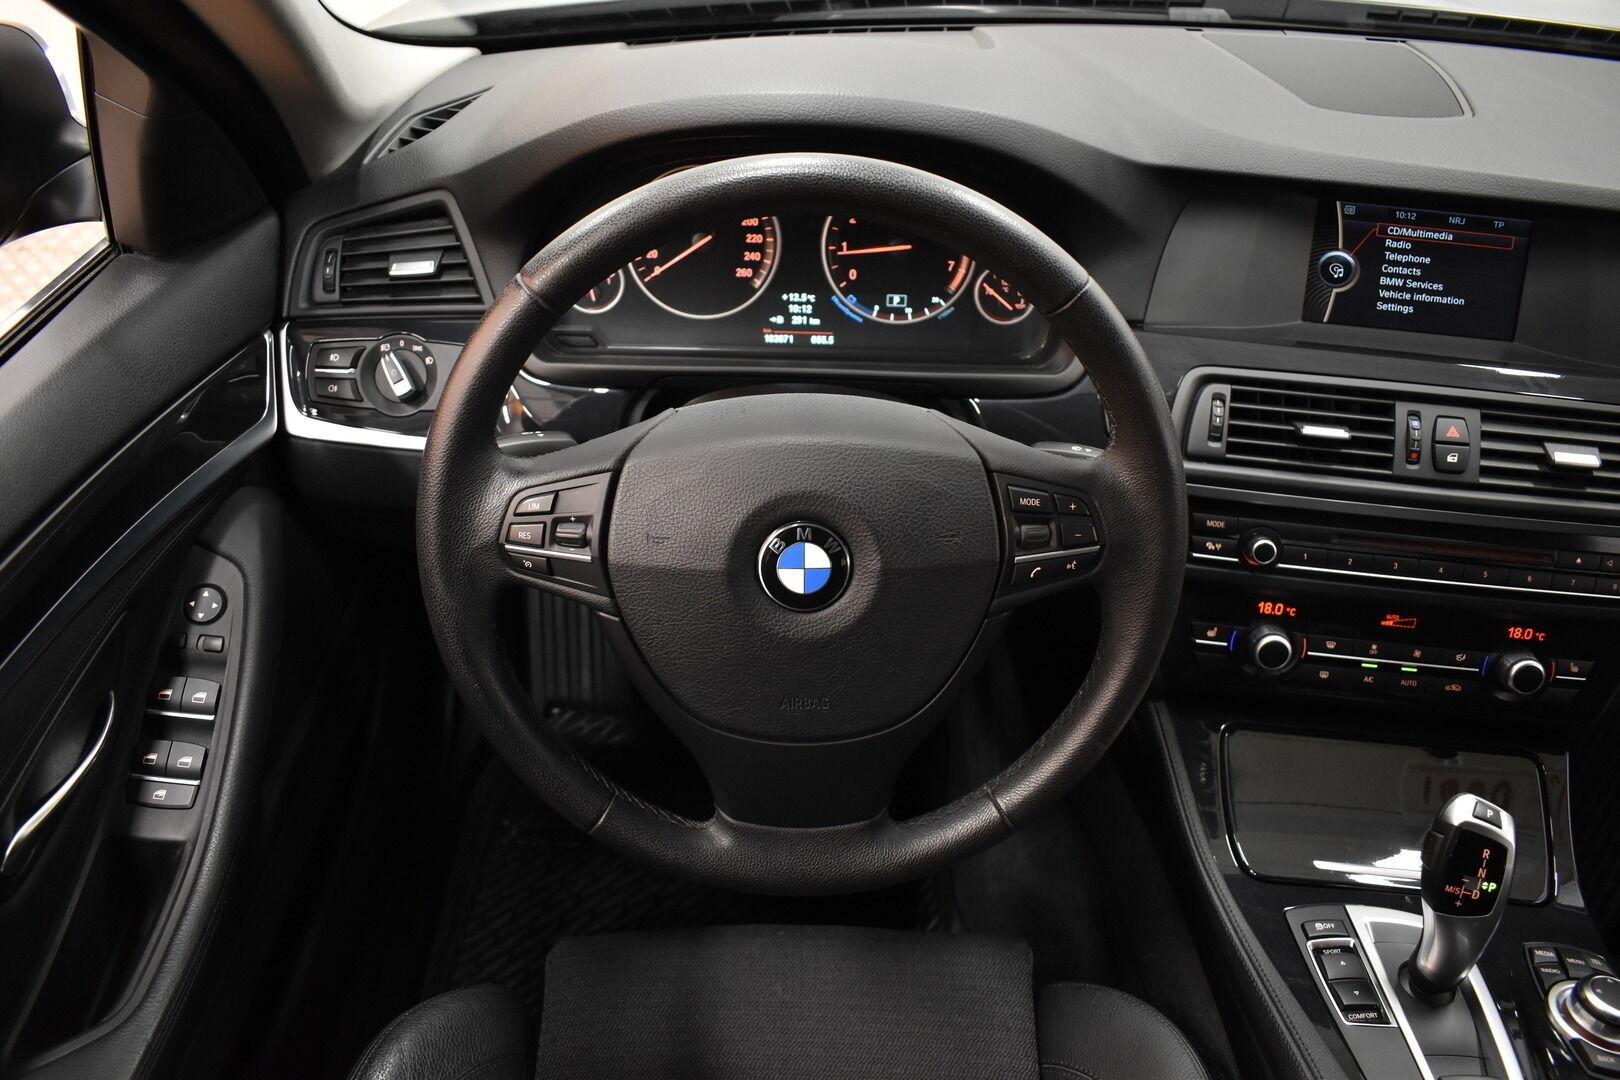 Musta Sedan, BMW 528 – POR-8128, kuva 12